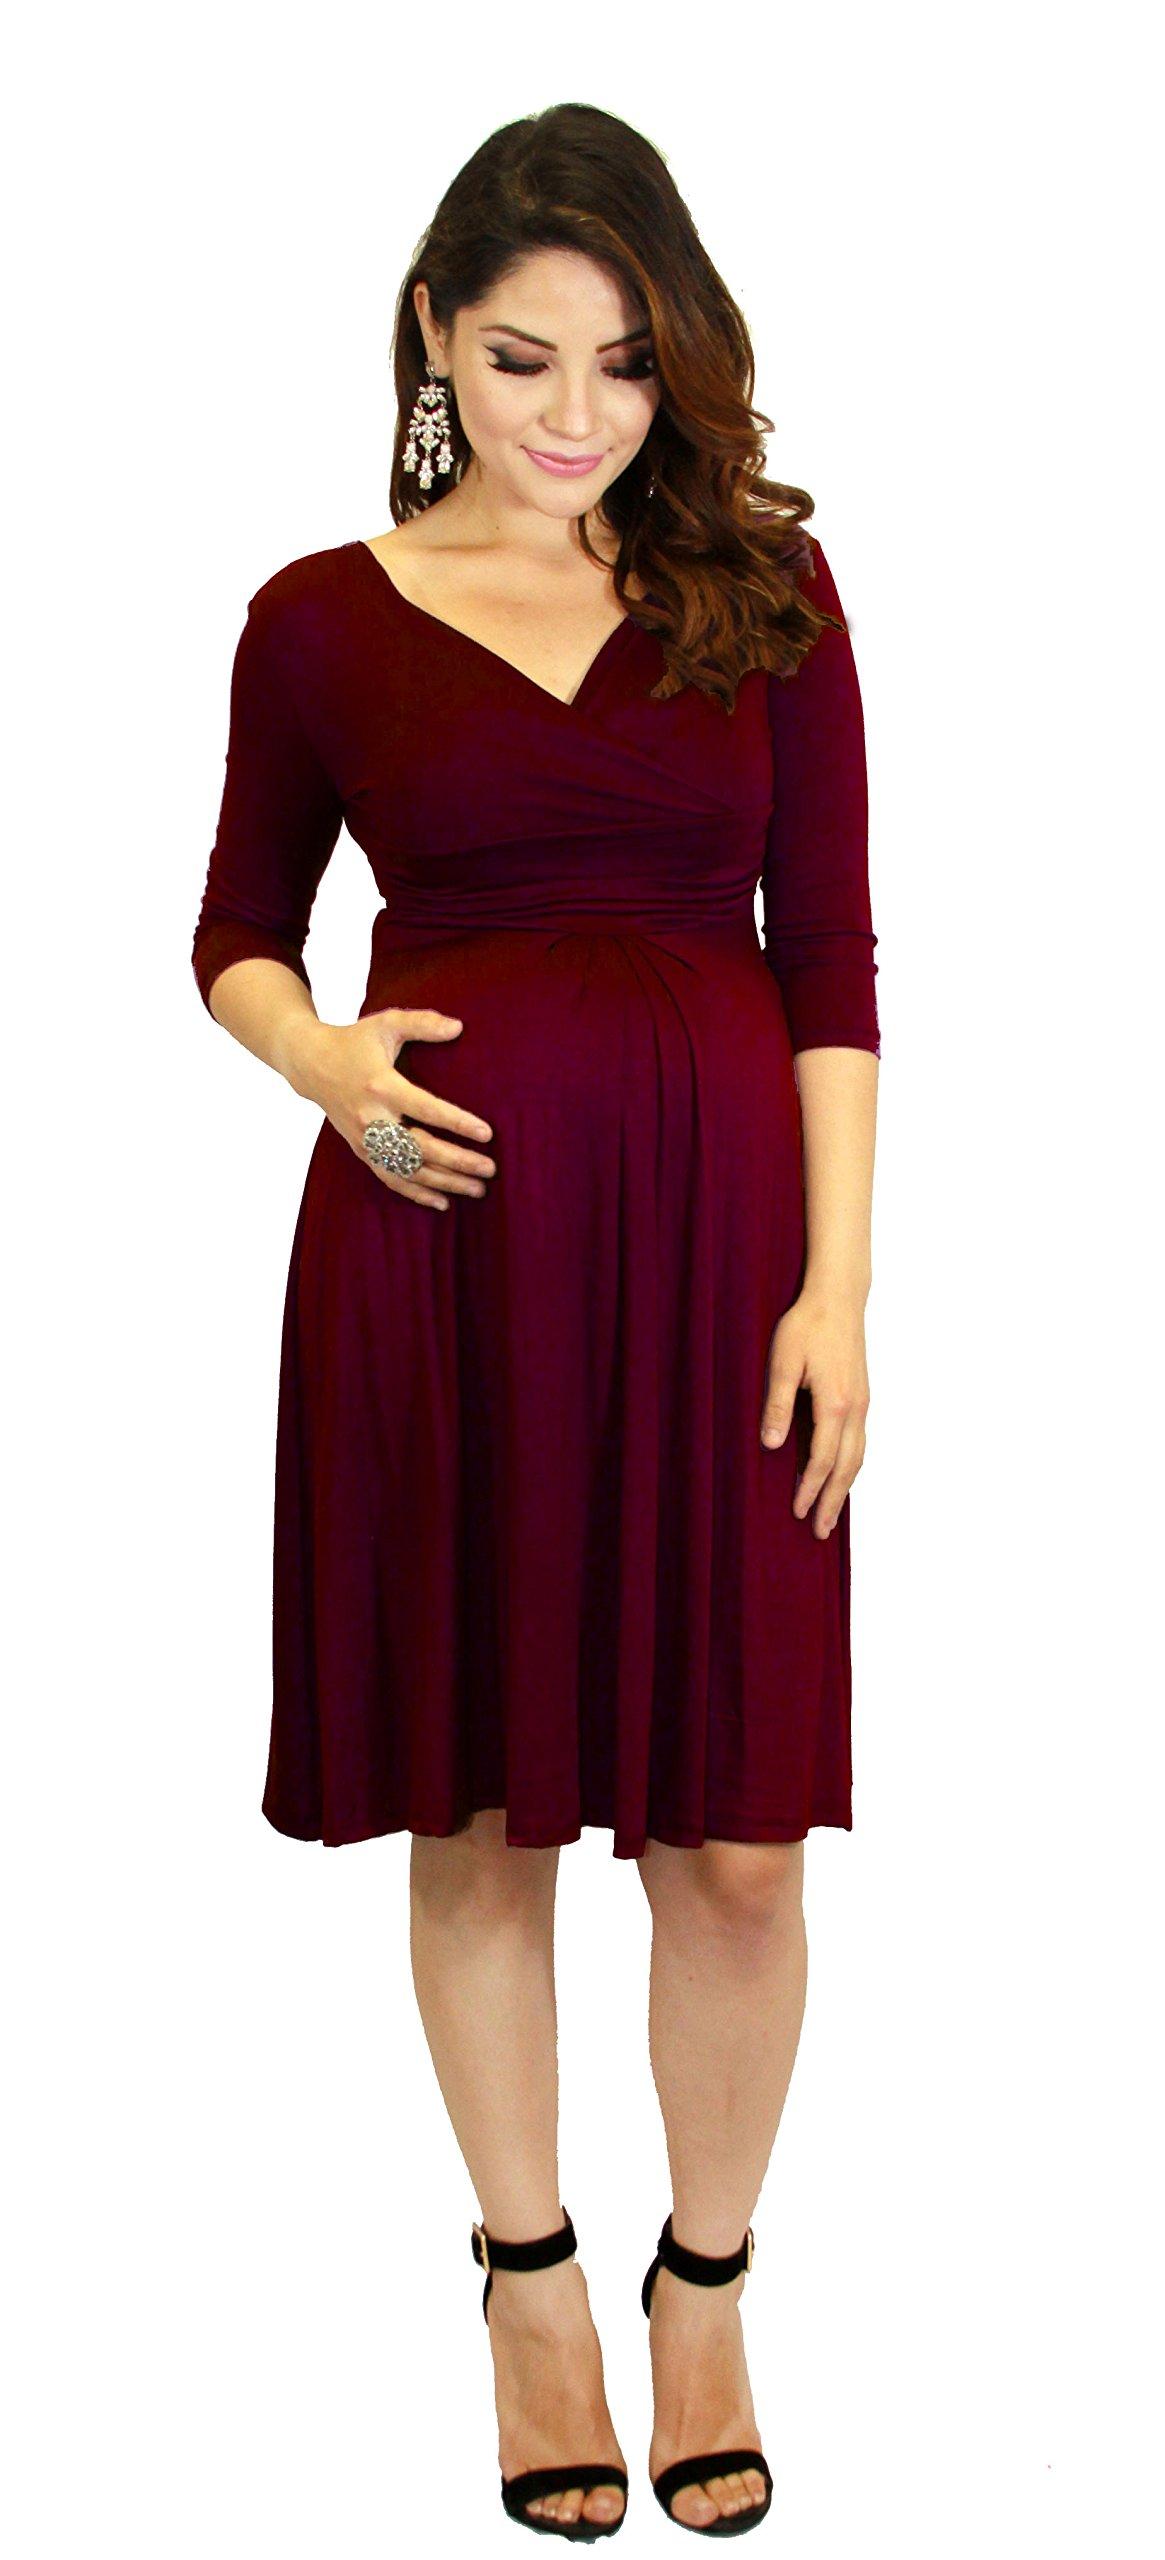 Long Sleeve Maternity Dress Knee Lenght Wedding BabyShower (m, burgundy)